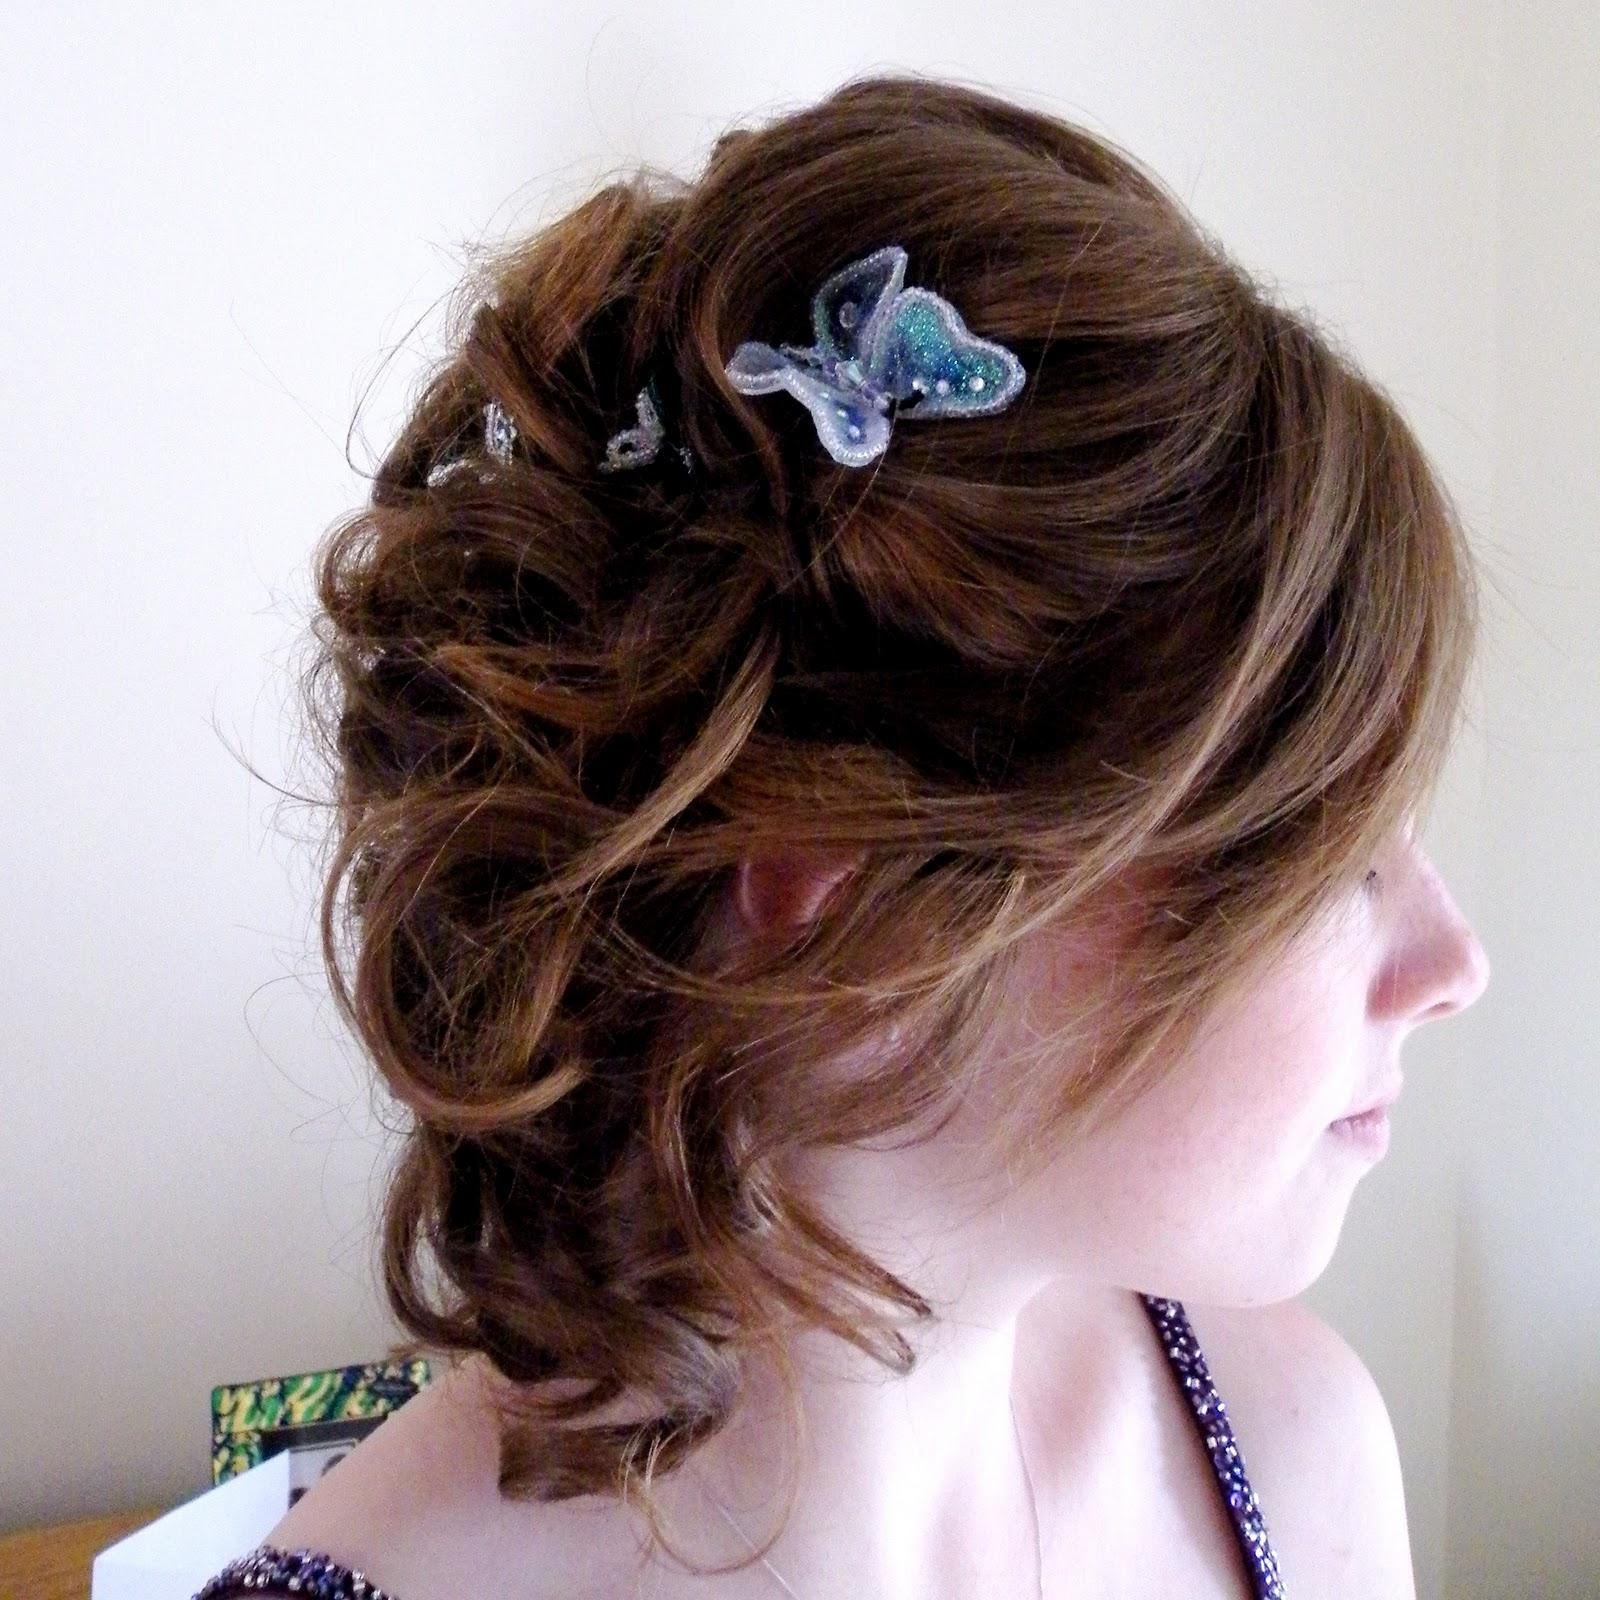 Sarahs wedding | Dalo's pin ups and wedding hair